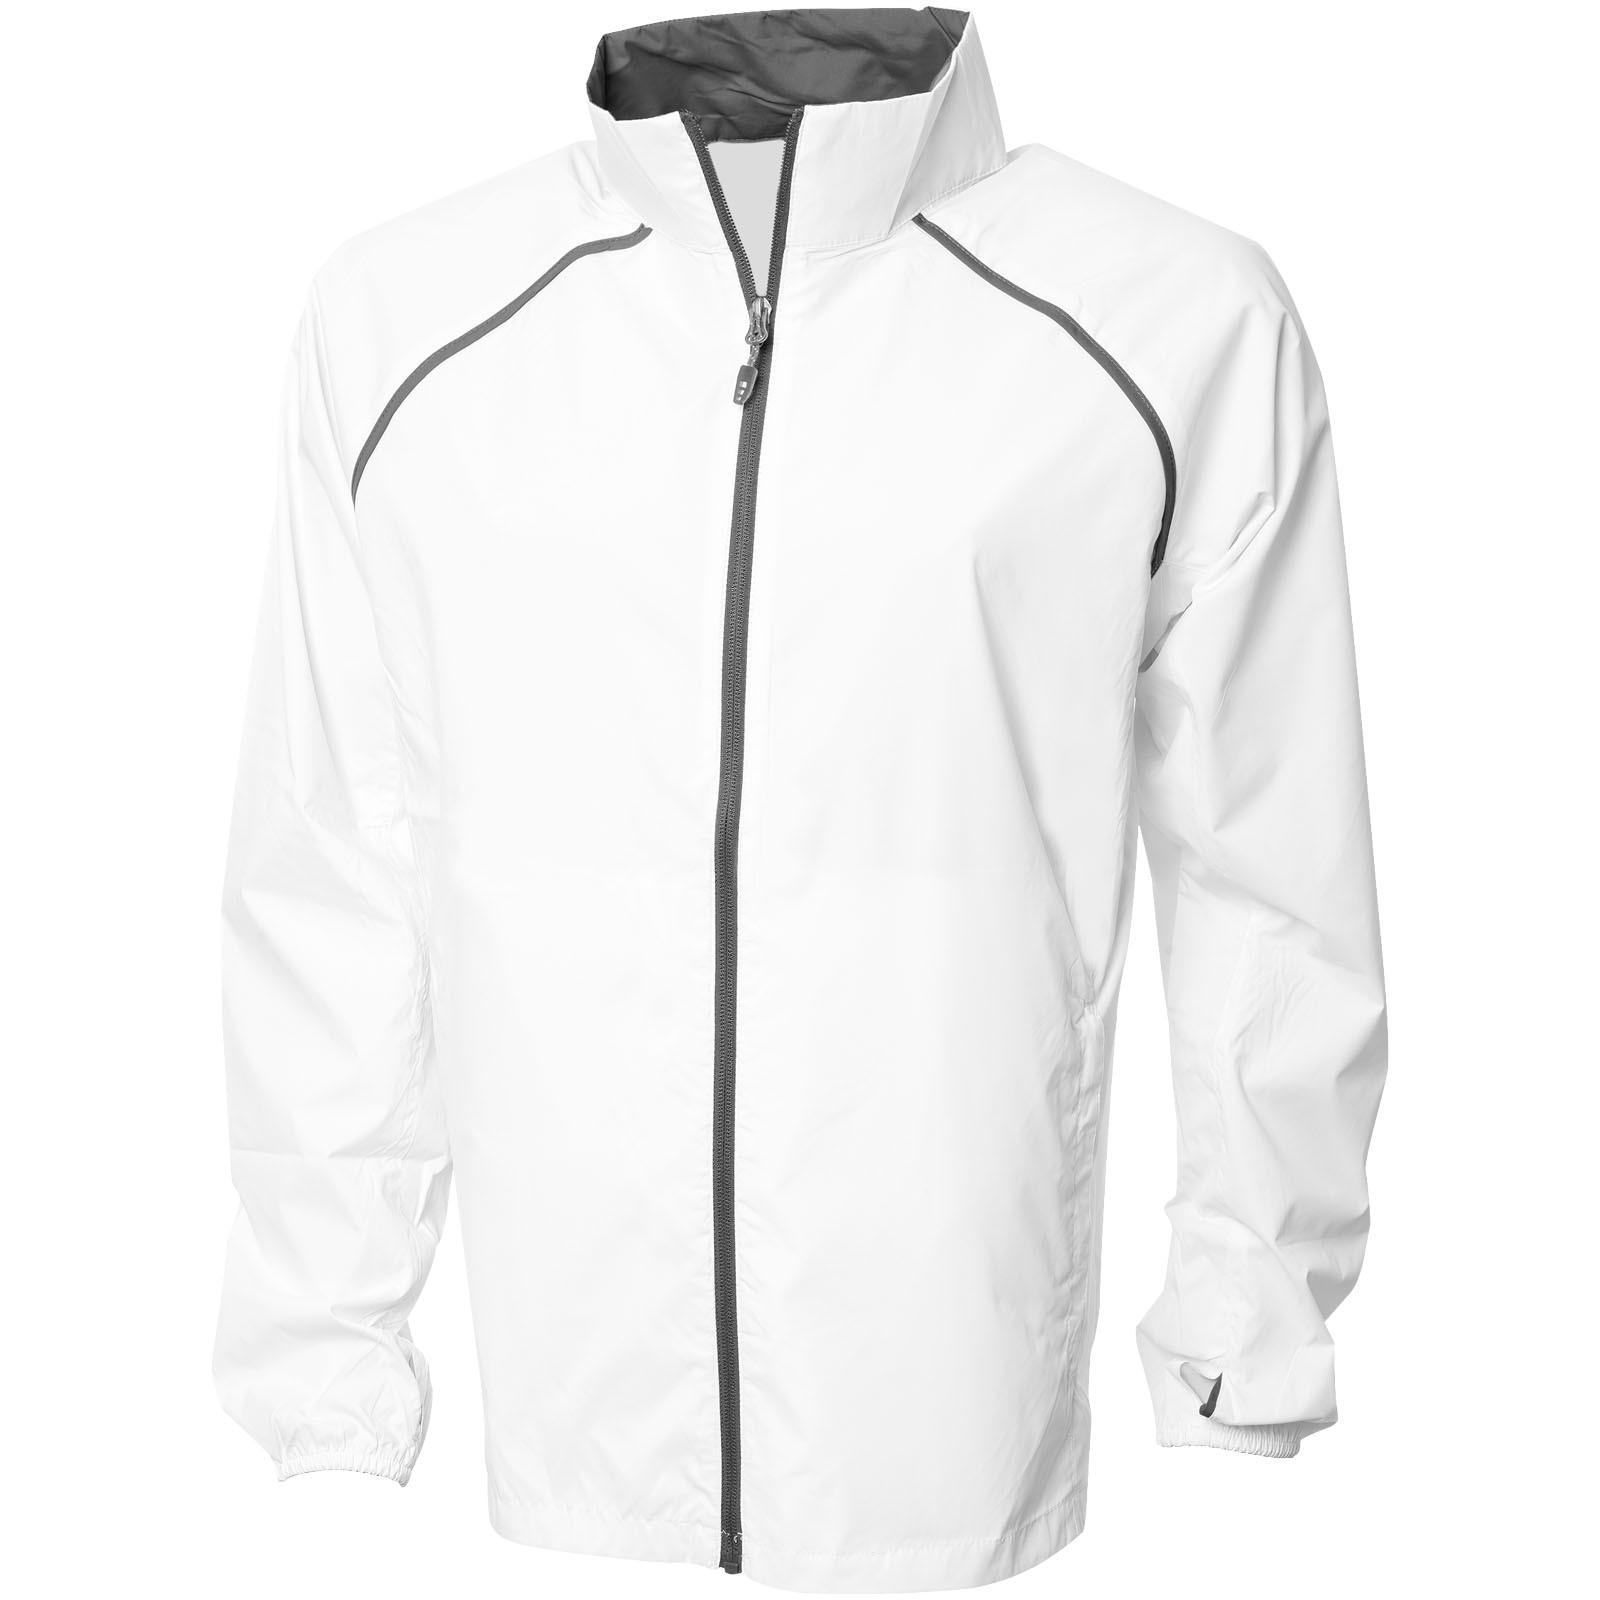 Egmont packable jacket - White / XS